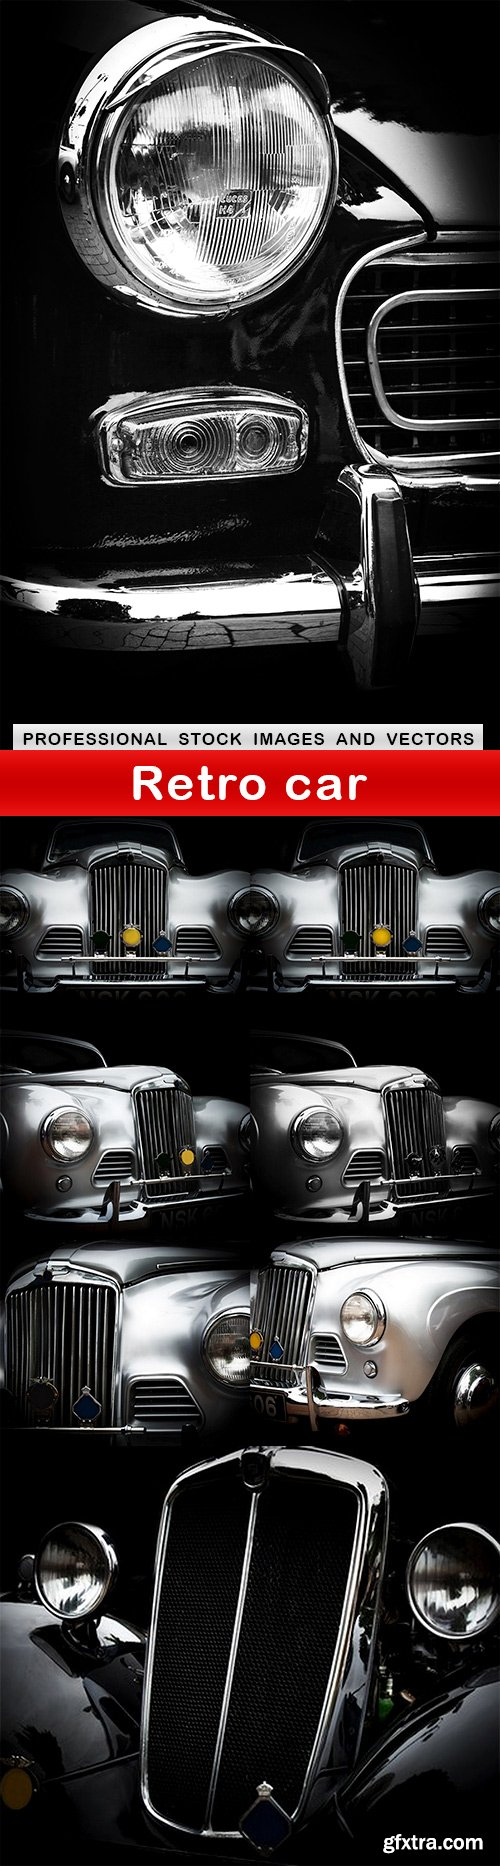 Retro car - 8 UHQ JPEG